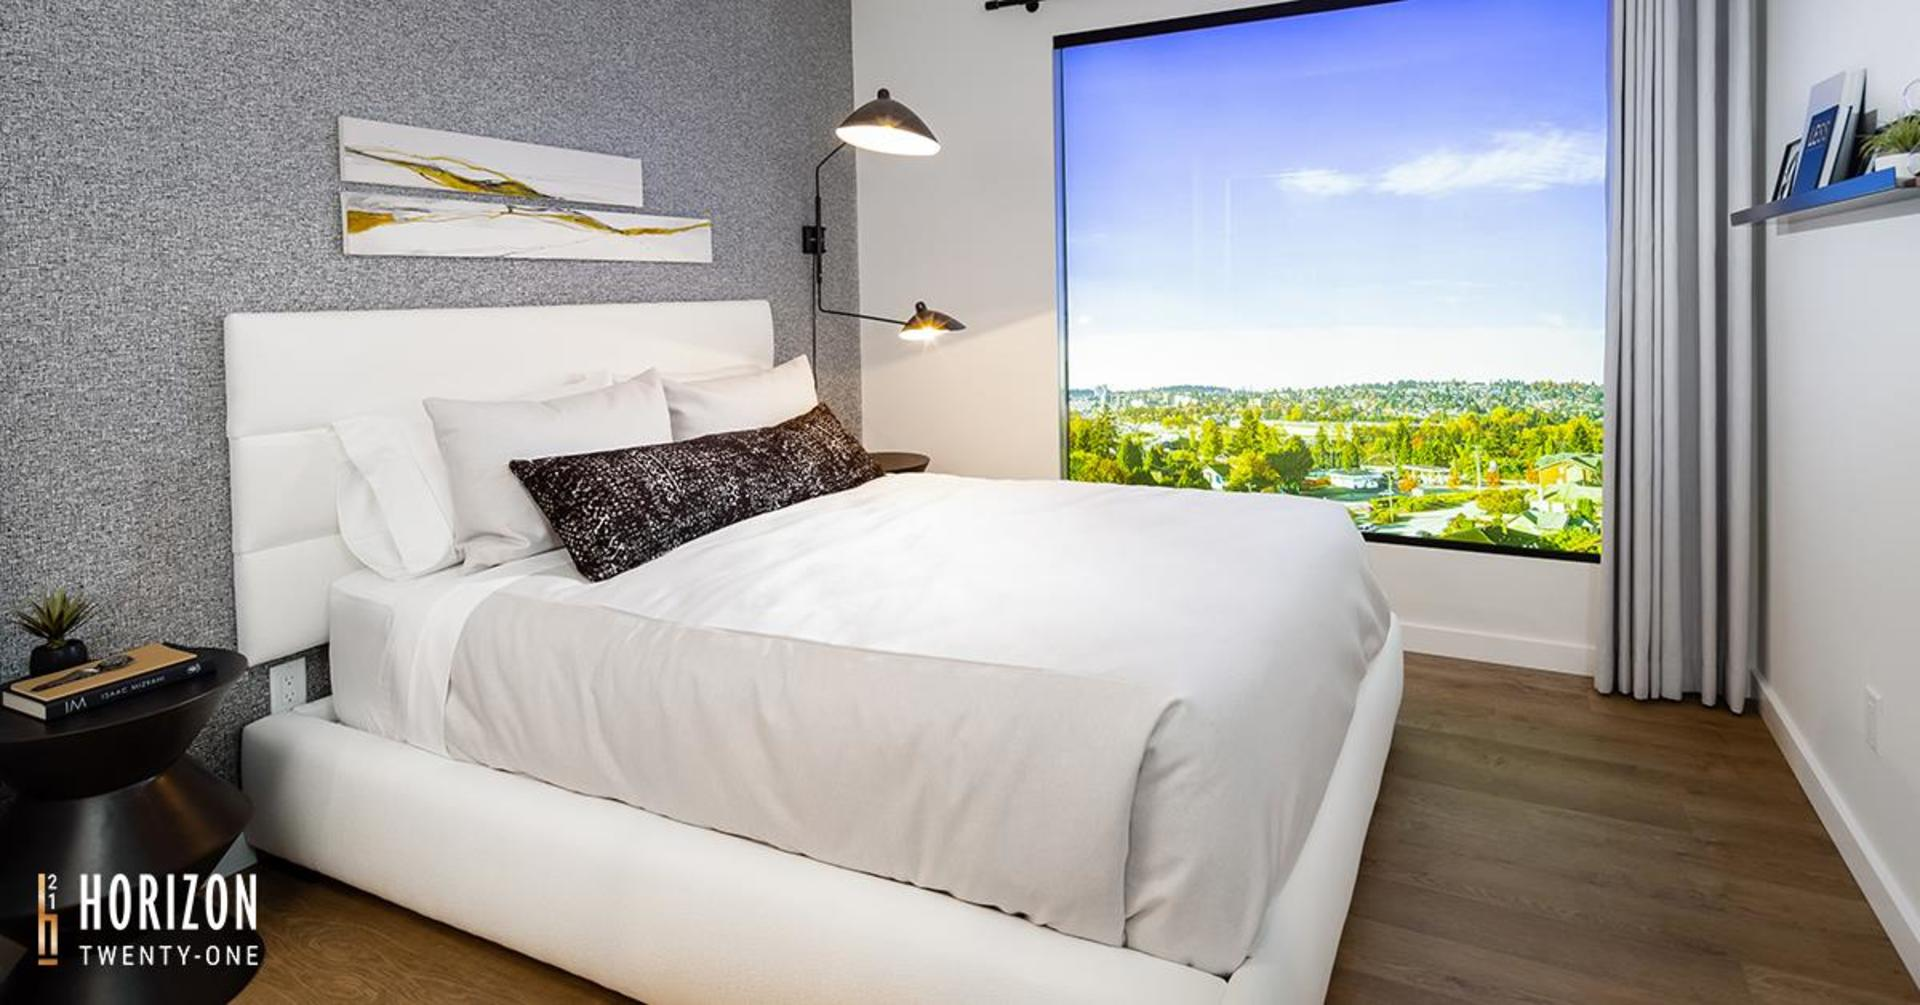 horizon-21-bedroom at Horizon 21 (218 Blue Mountain, Maillardville, Coquitlam)